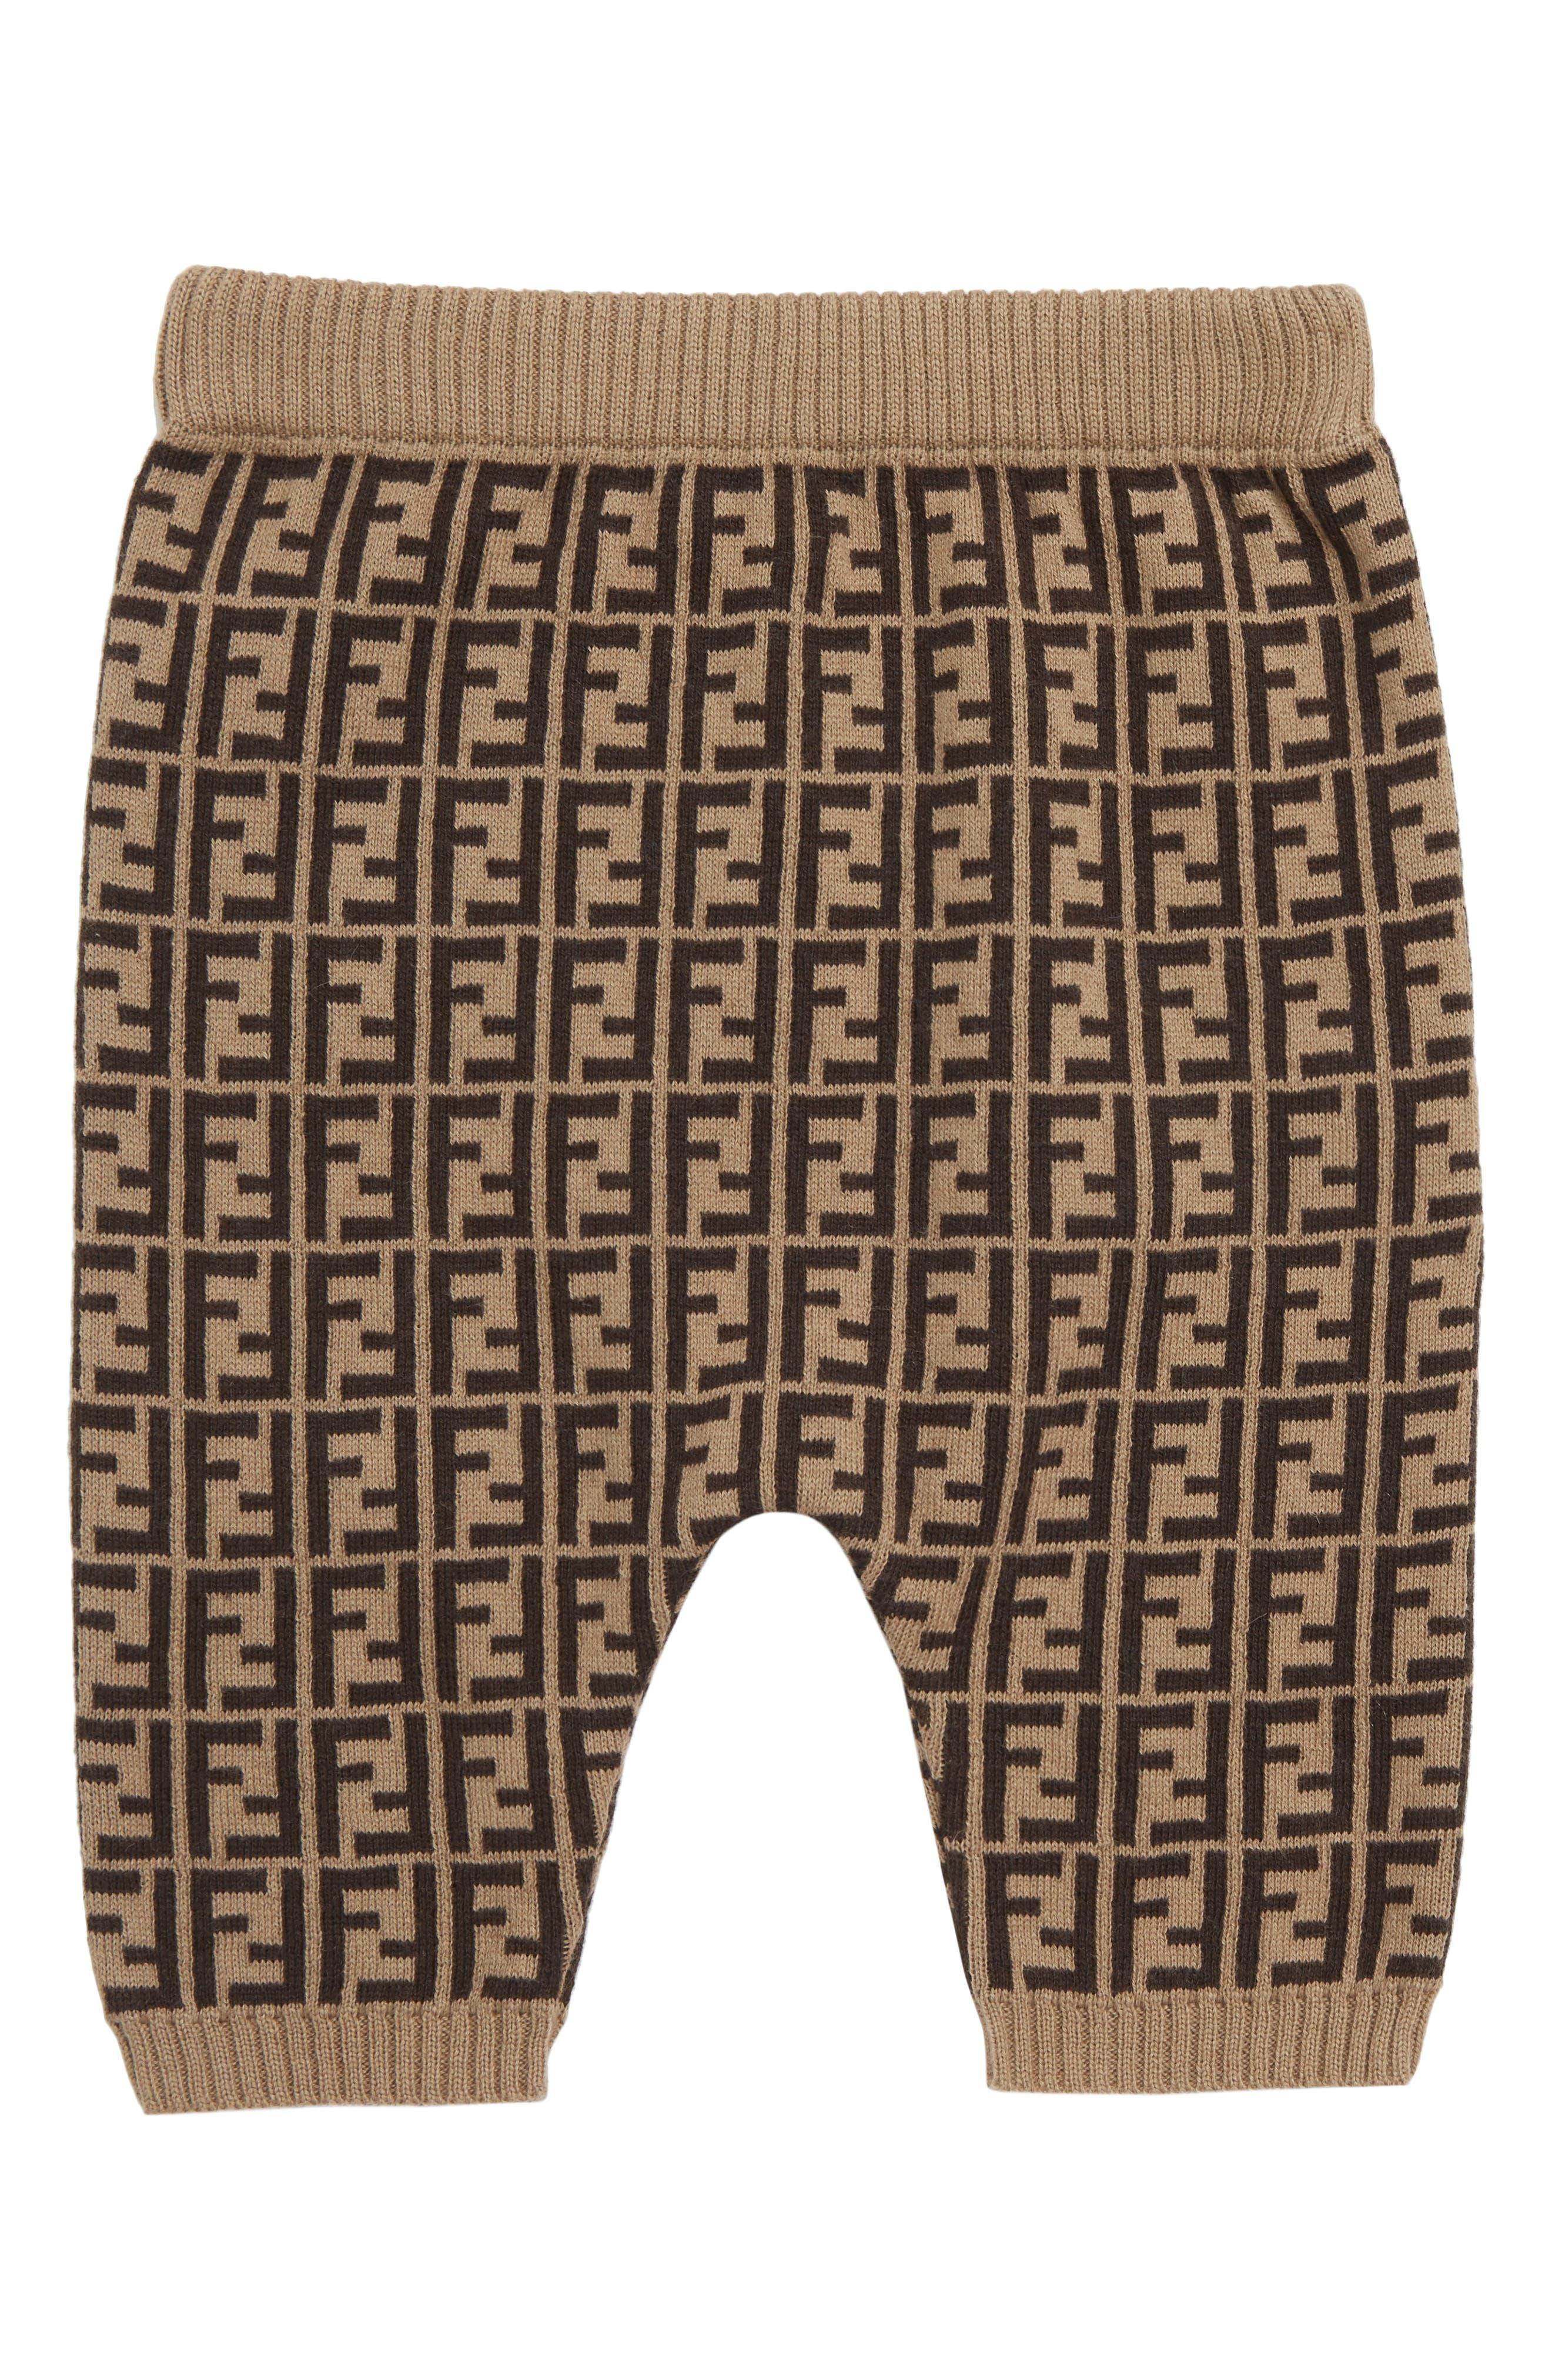 FENDI, Logo Sweater Knit Pants, Main thumbnail 1, color, F0LMJ BROWN